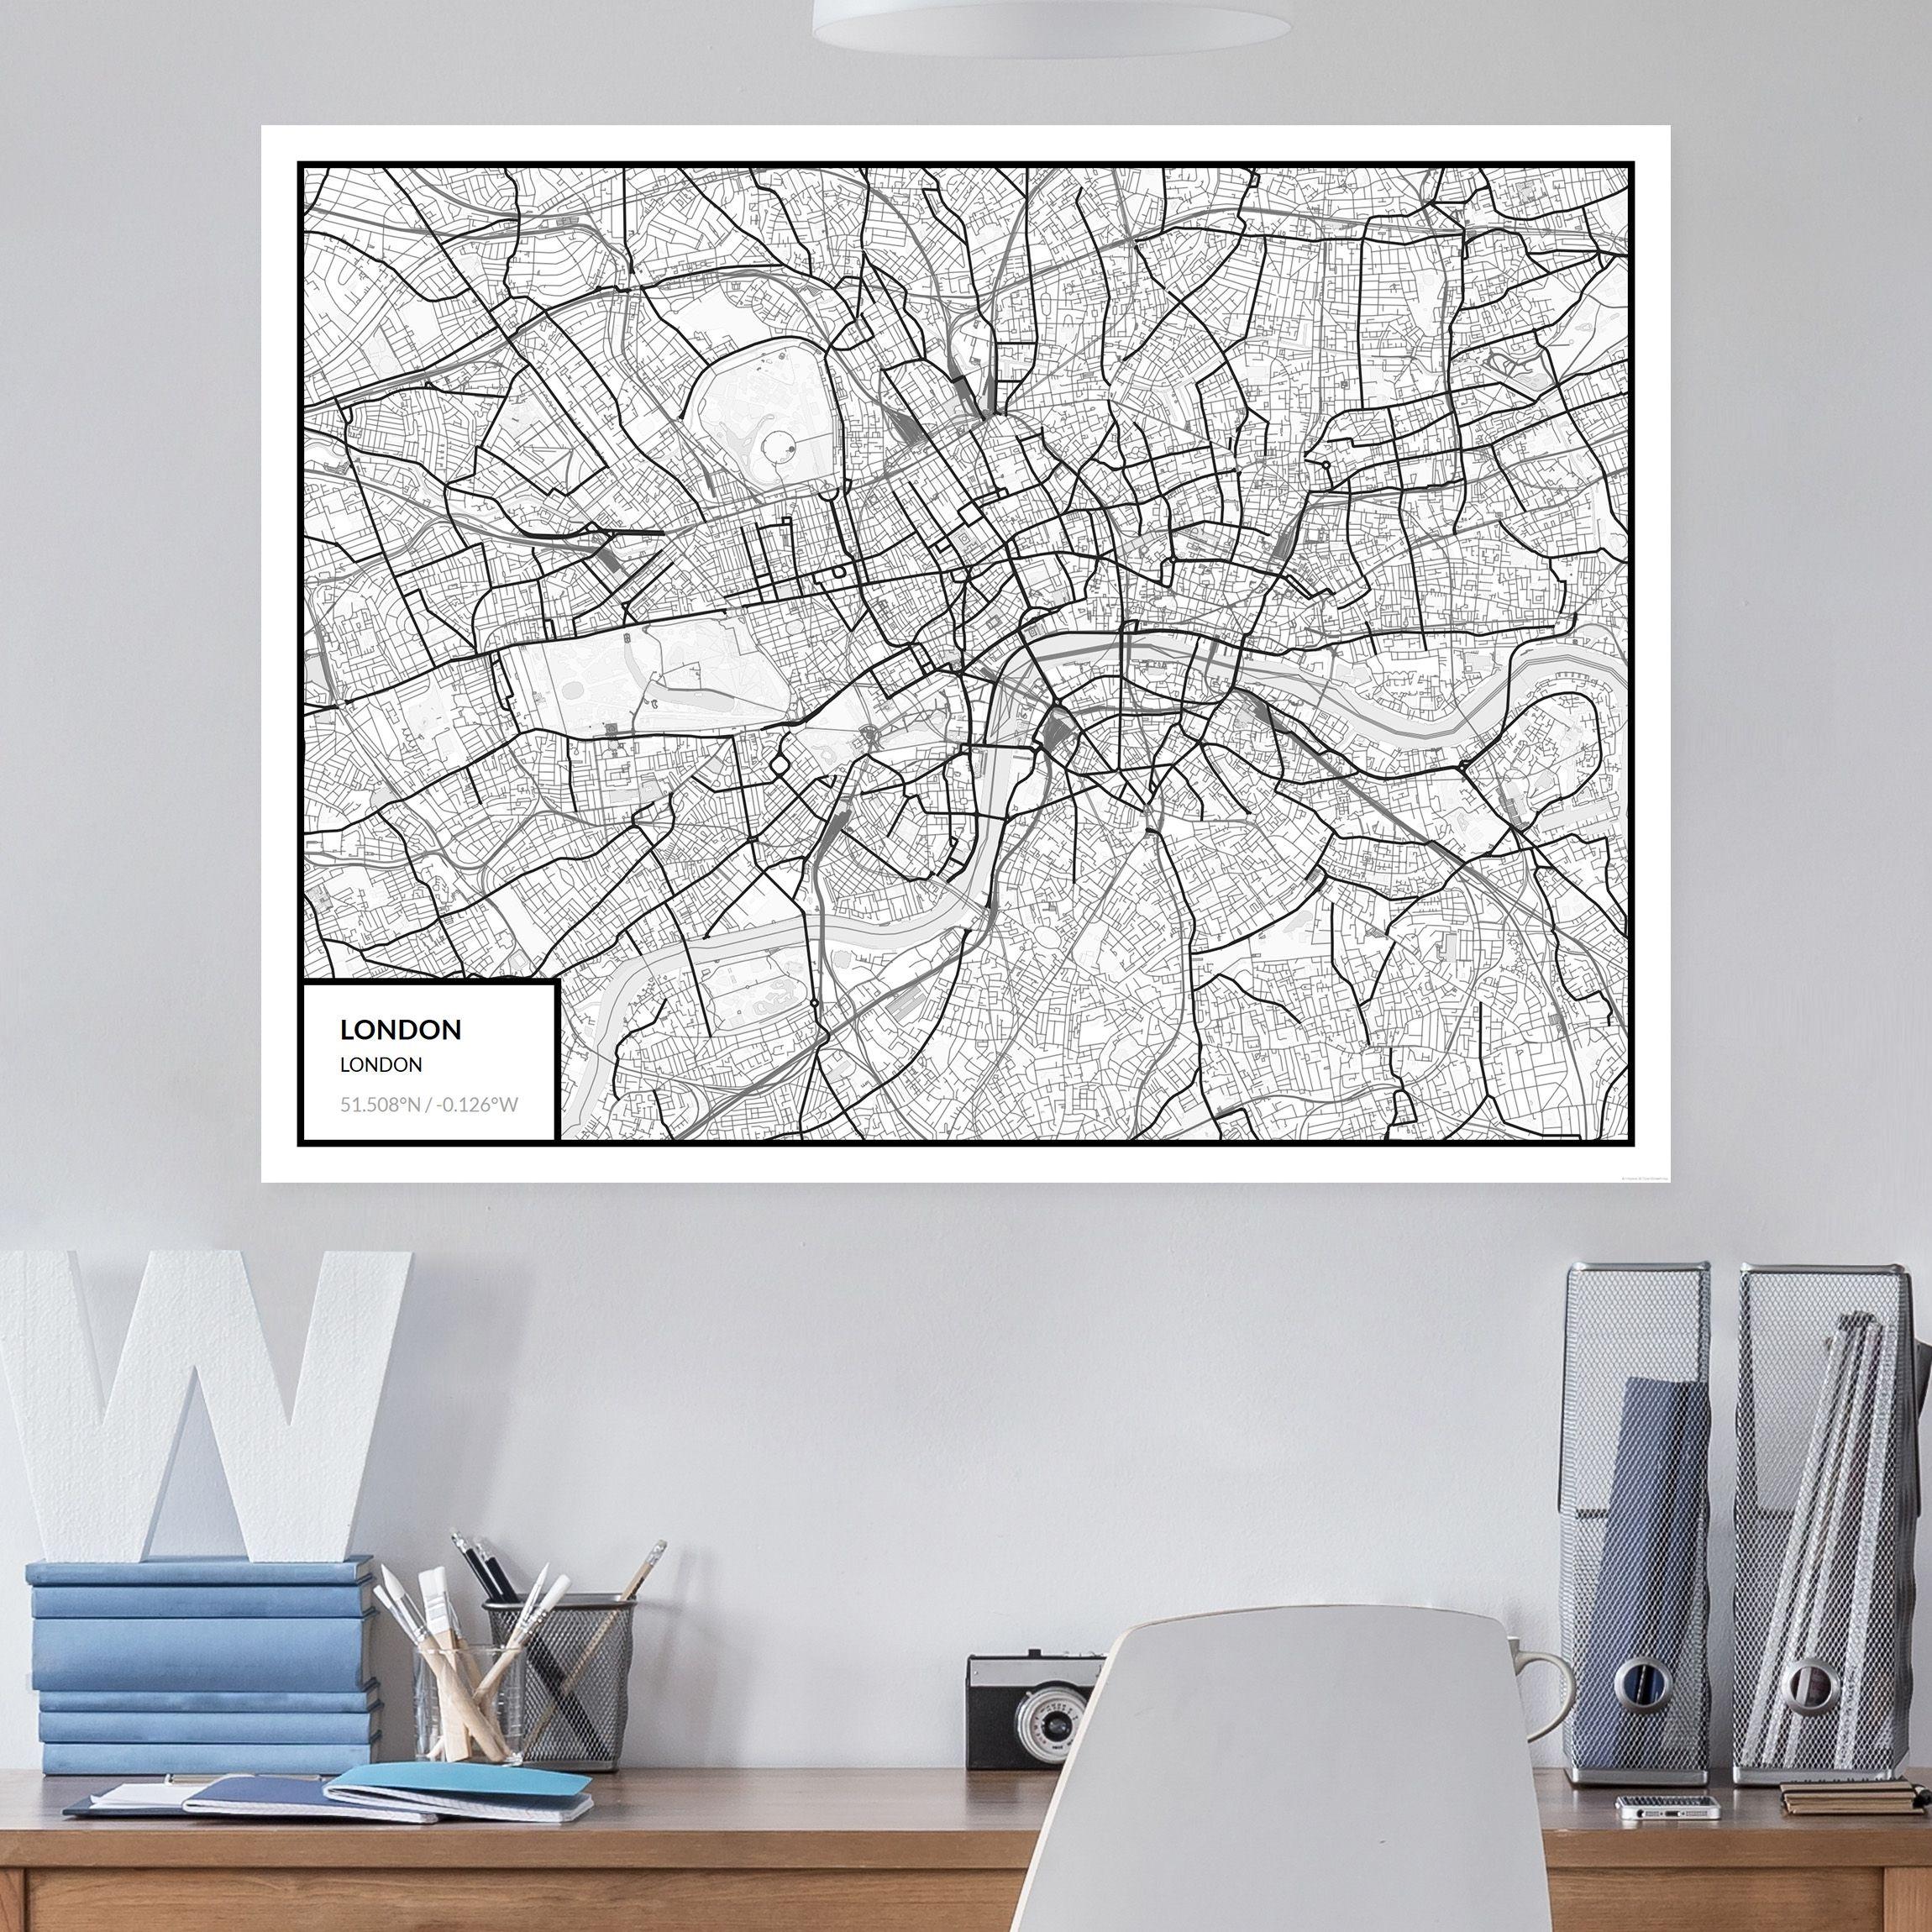 Spacious Wandbilder Selbst Gestalten Gallery Of #map #maker #wandbilder #glasbilder #leinwandbilder #stadtplan #landkarte